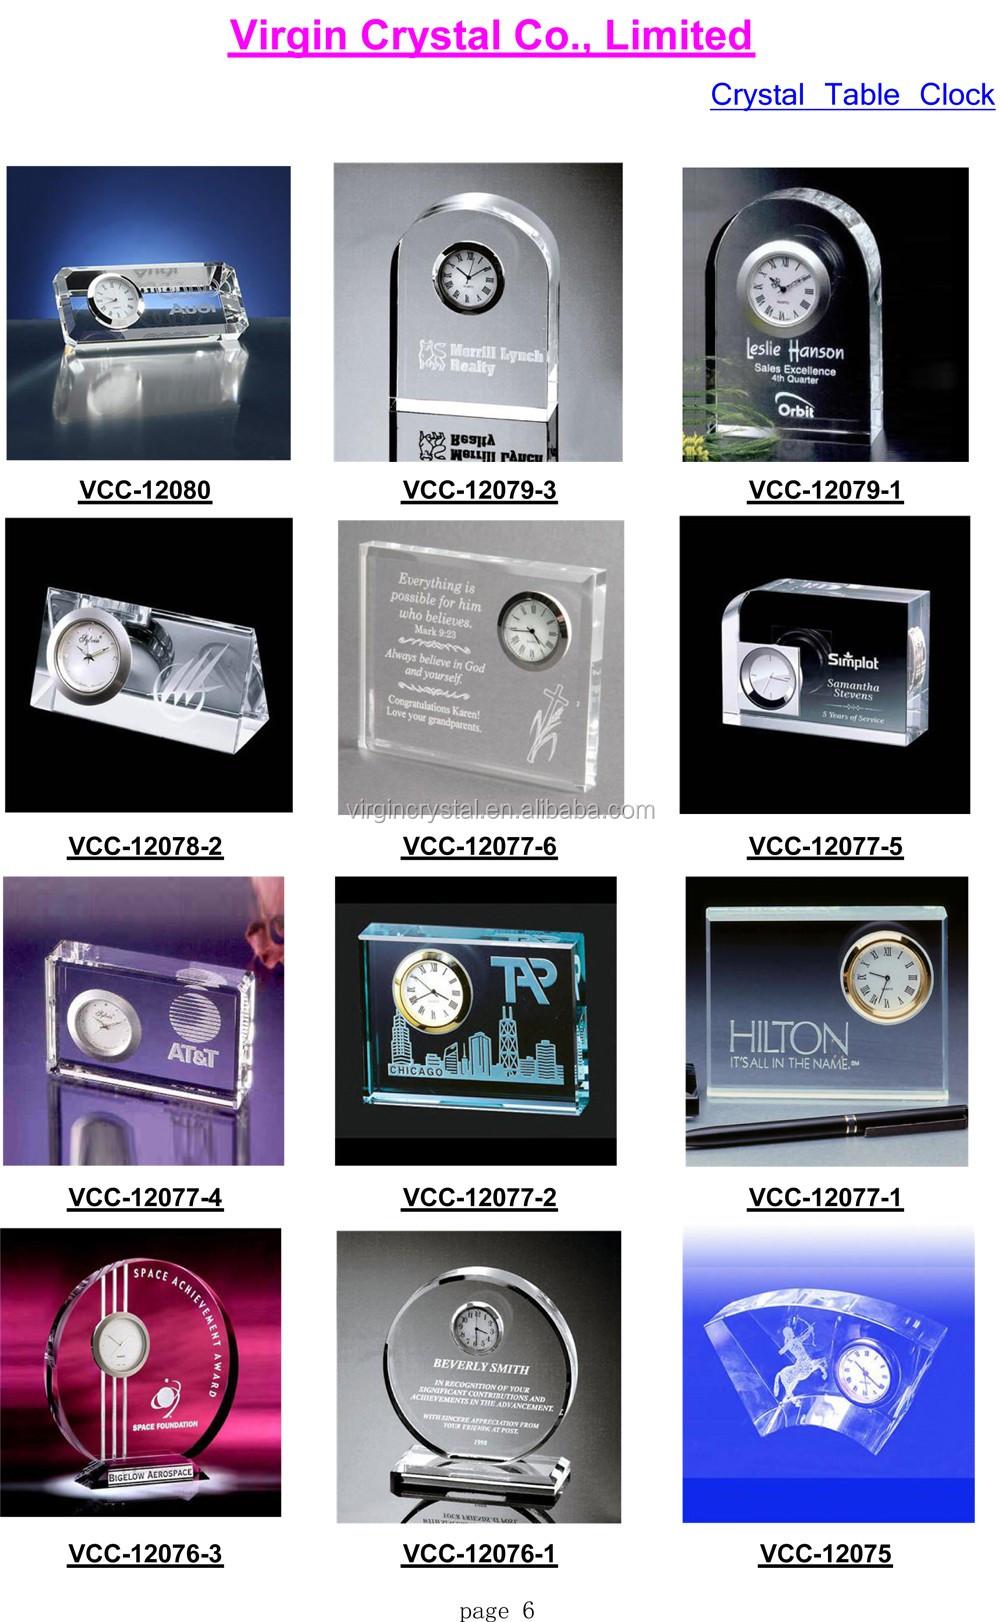 2016 Crystal Table Clock and Mechanical clock Catalog-6.jpg